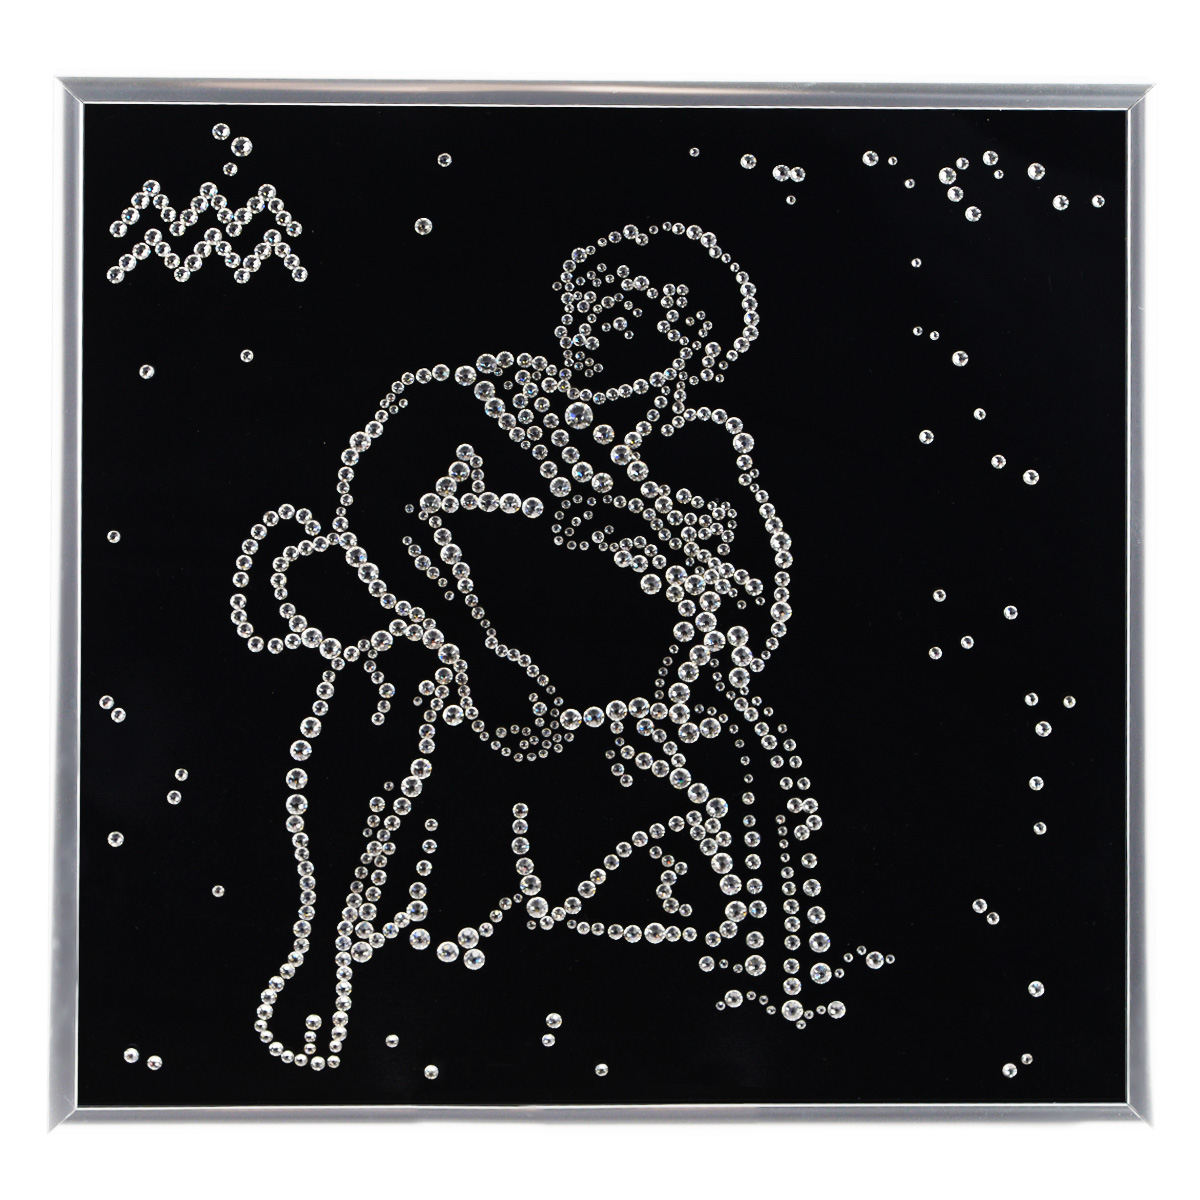 Картина с кристаллами Swarovski Знак зодиака. Водолей, 26 см х 26 см